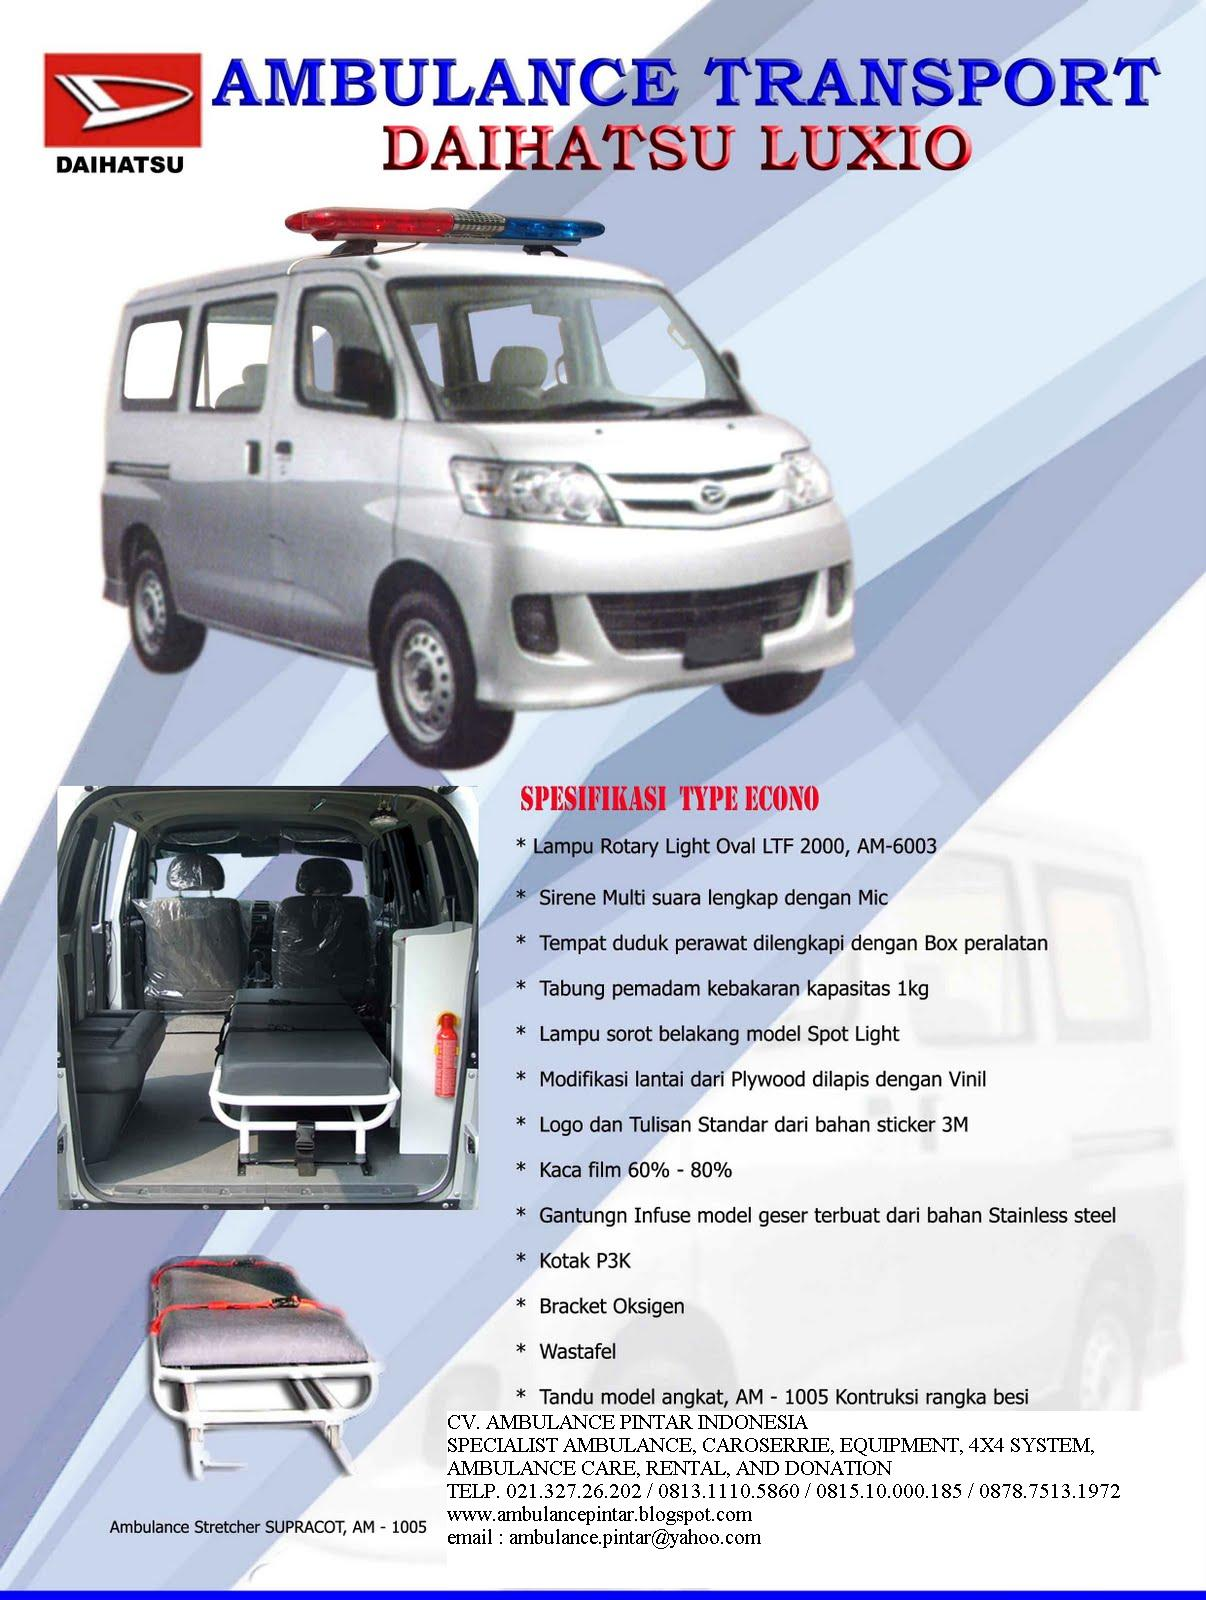 Mobil Ambulance Januari 2012 Kotak P3k Deluxe